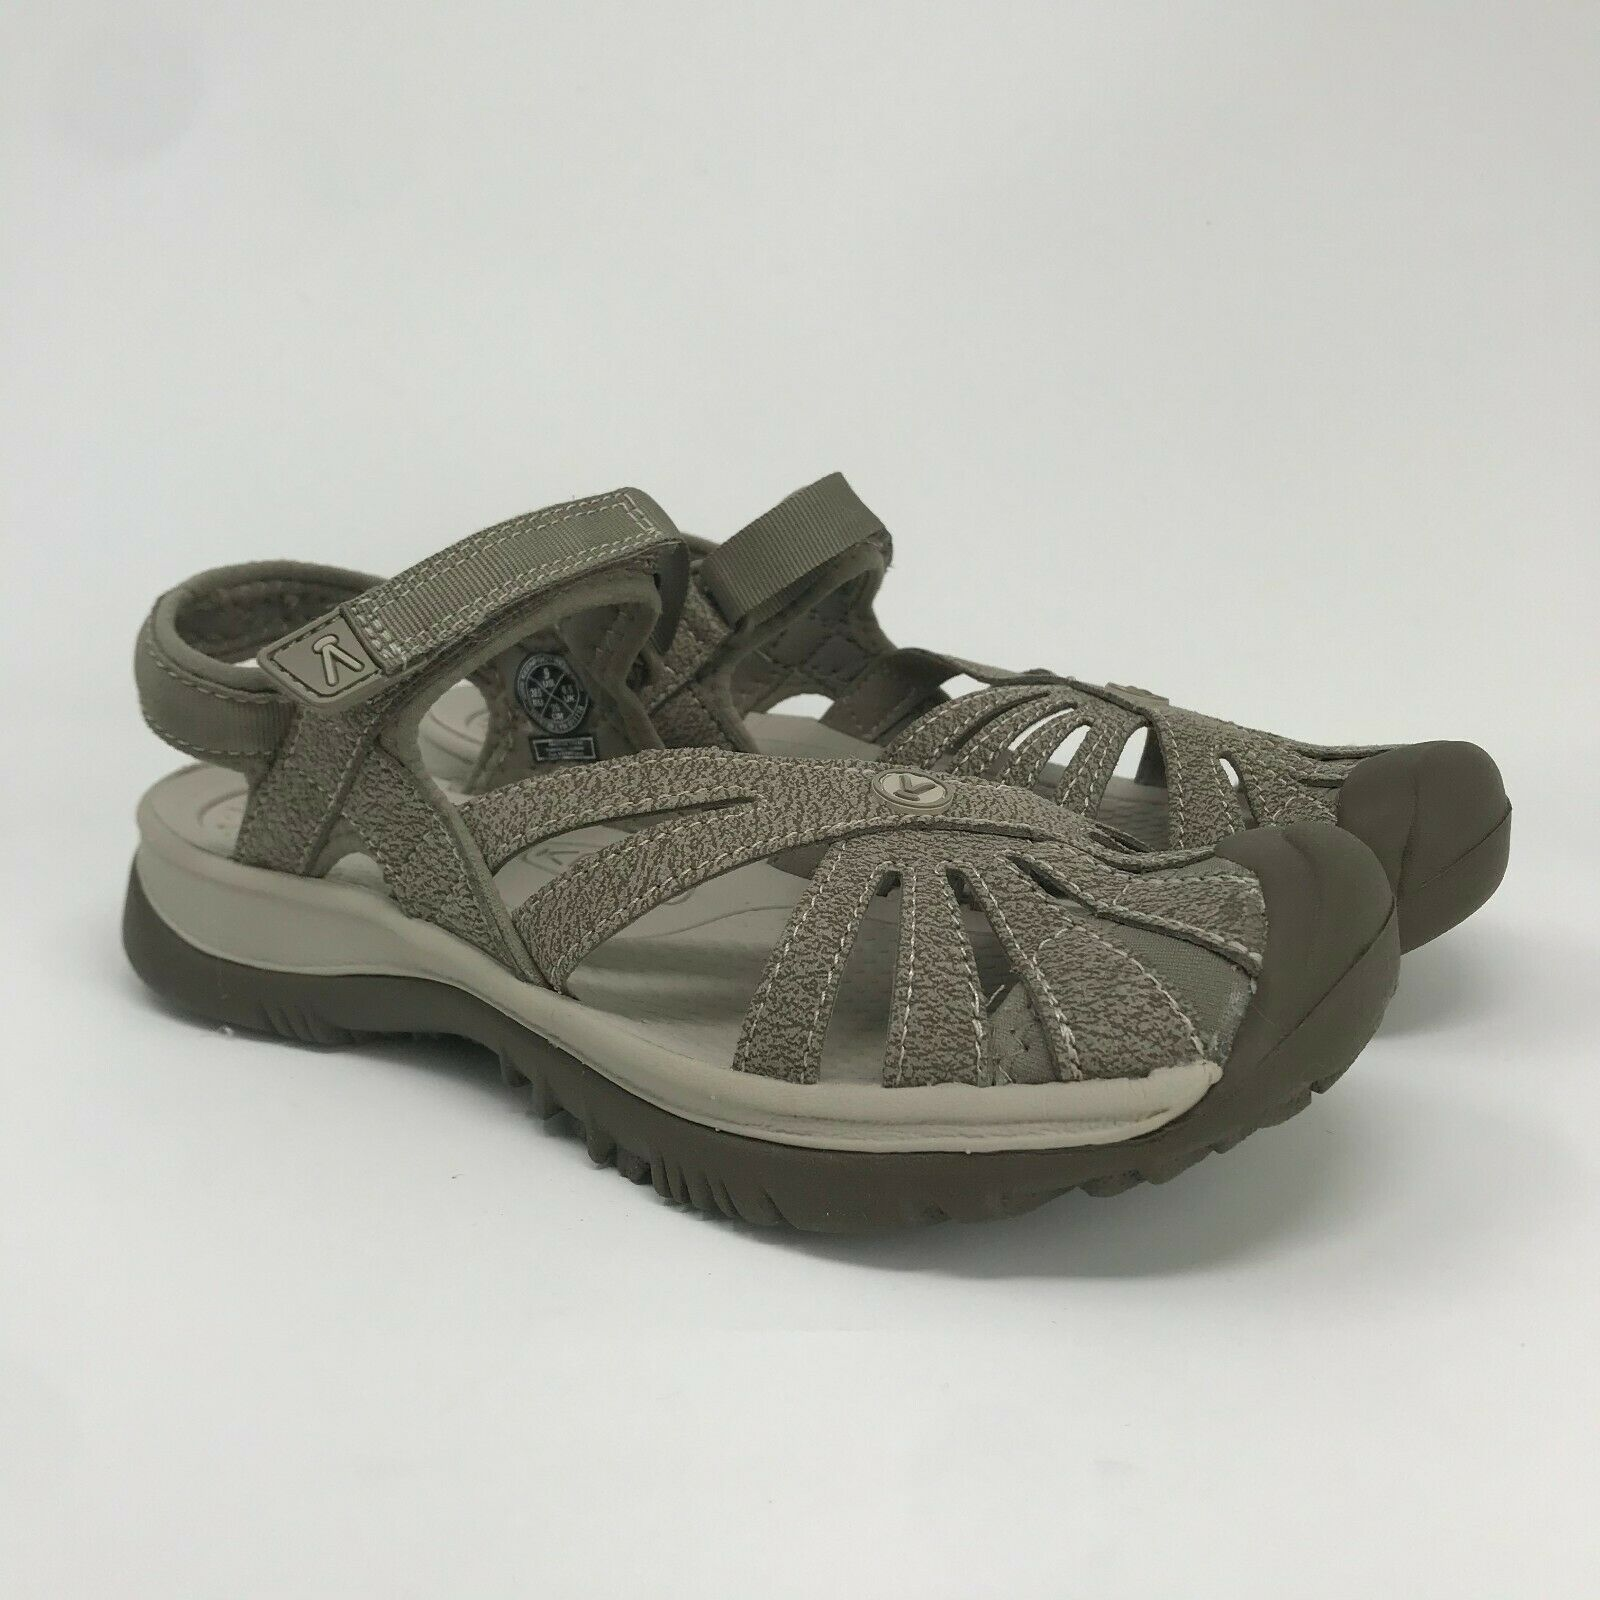 NEW Women/'s Keen Reisen MJ #1012351 Black Leather Supportive Casual Shoe